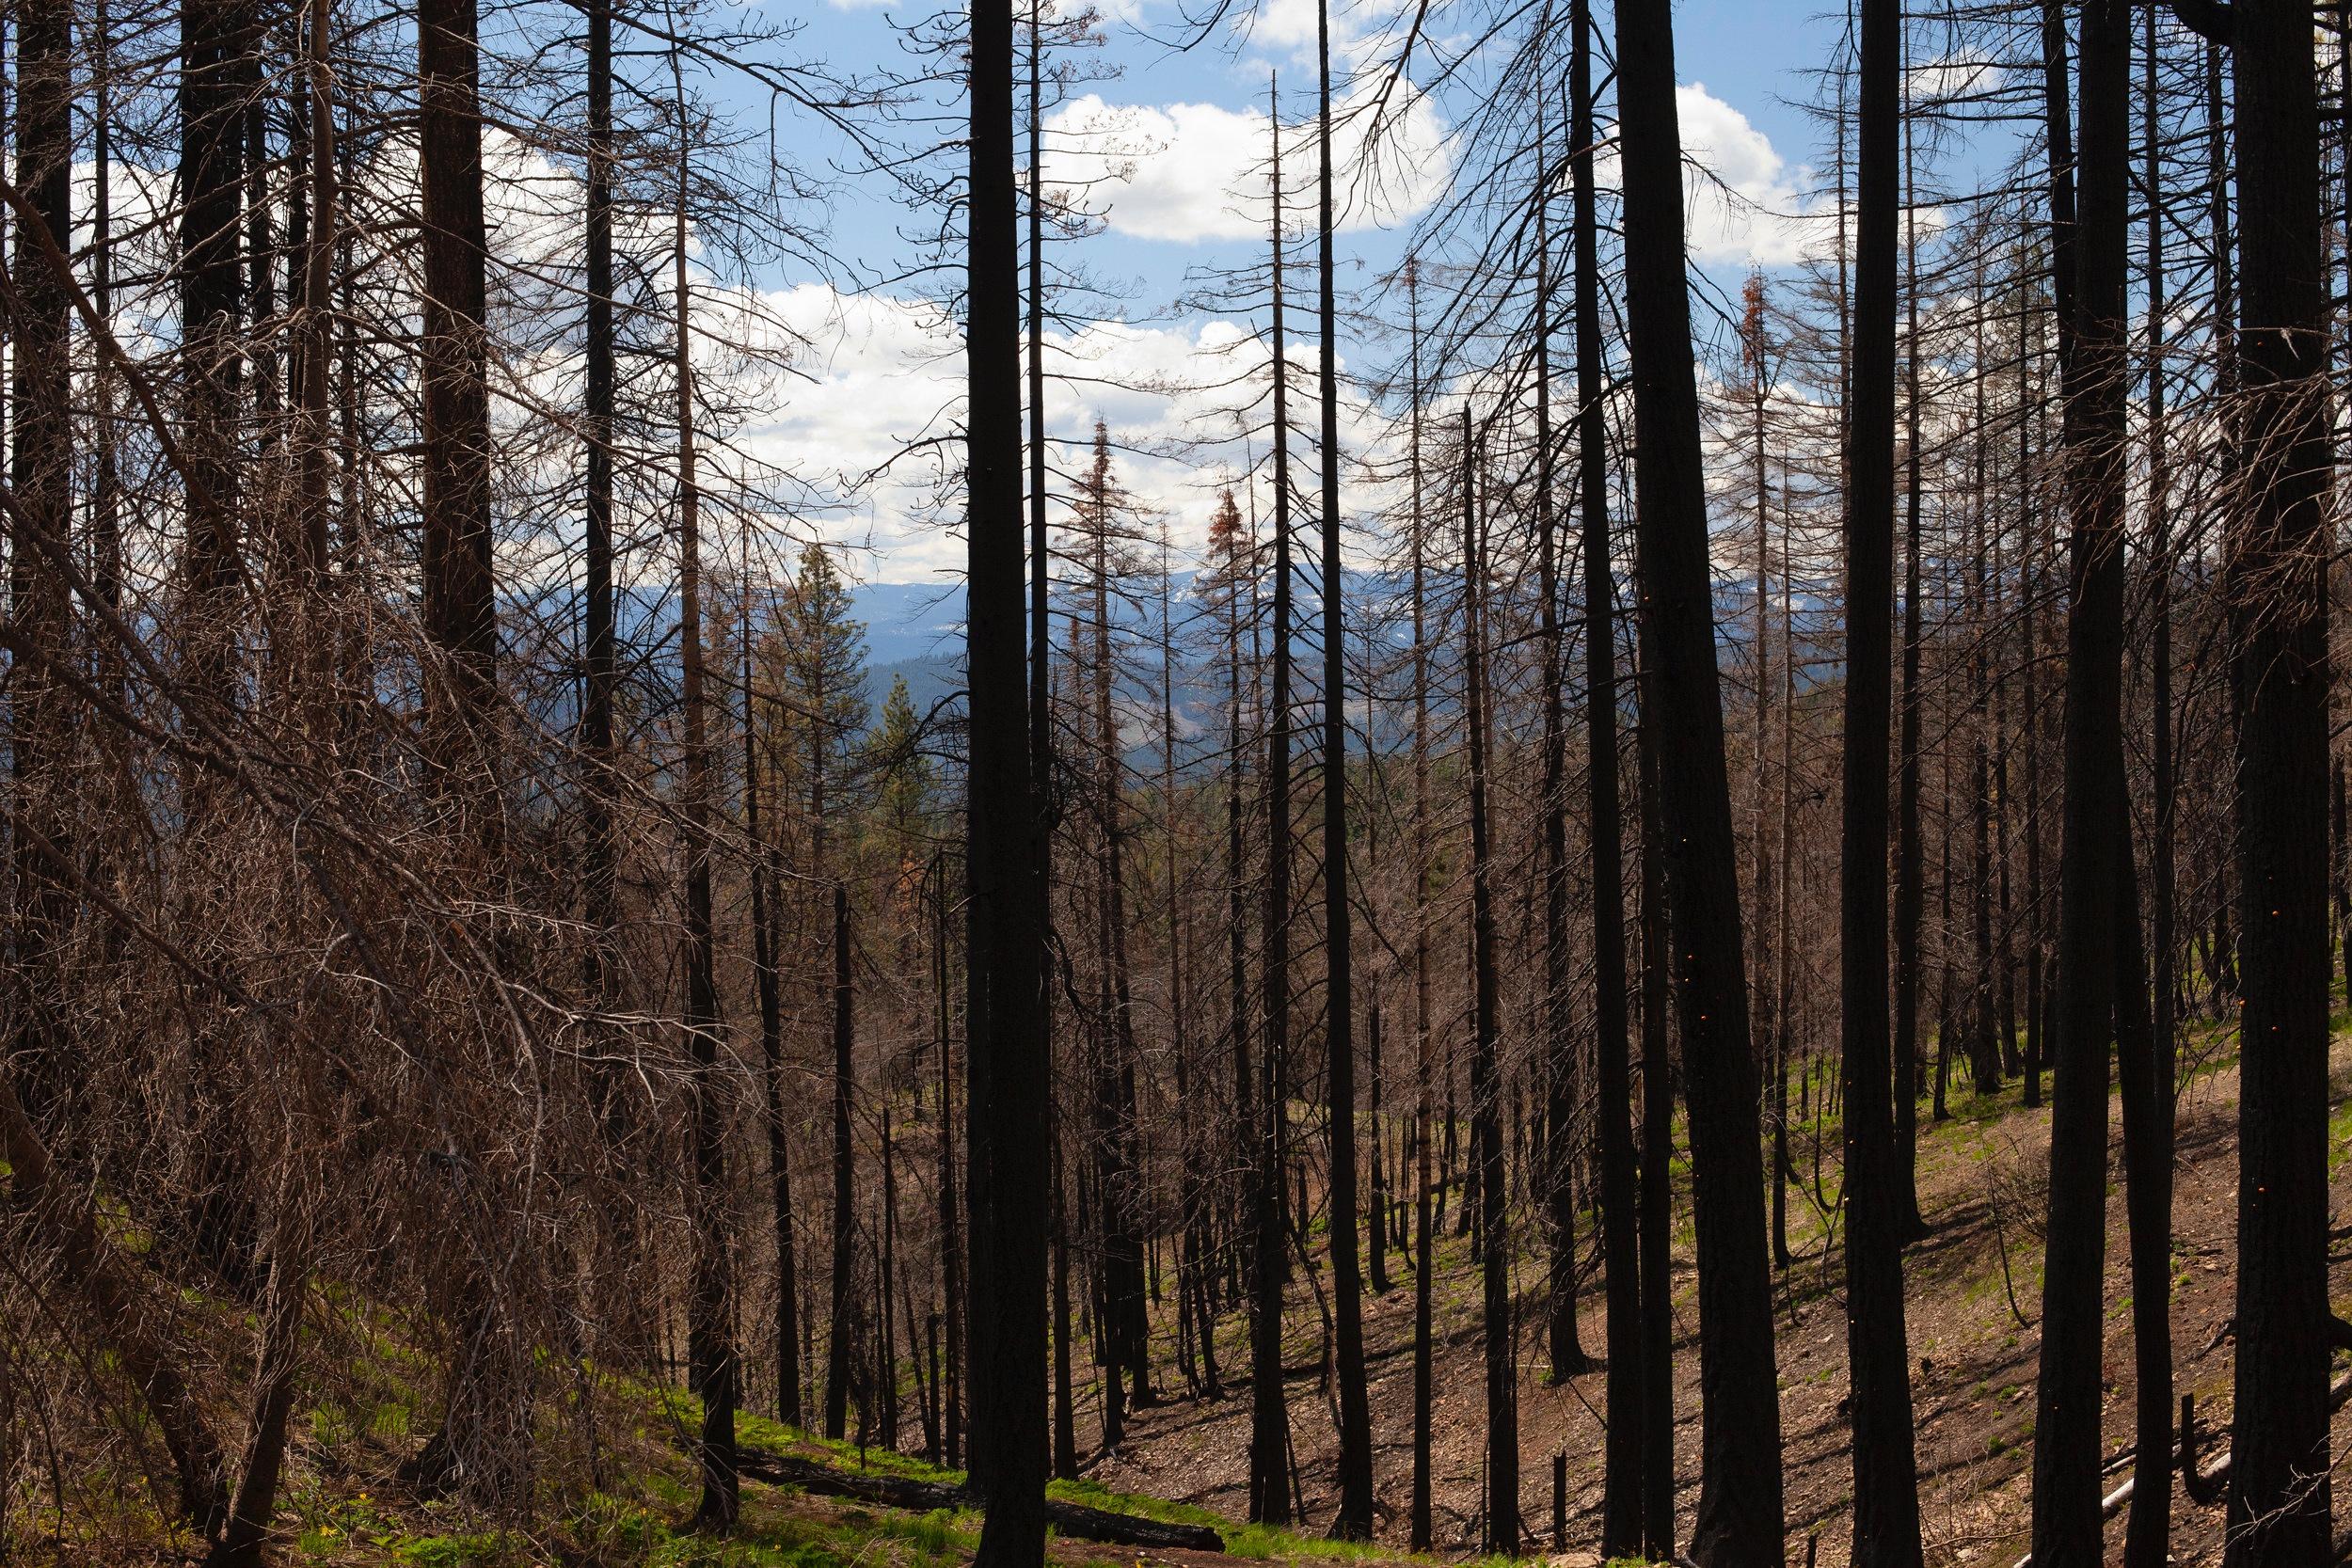 Teanaway Community Forest.  @casswalkerphoto